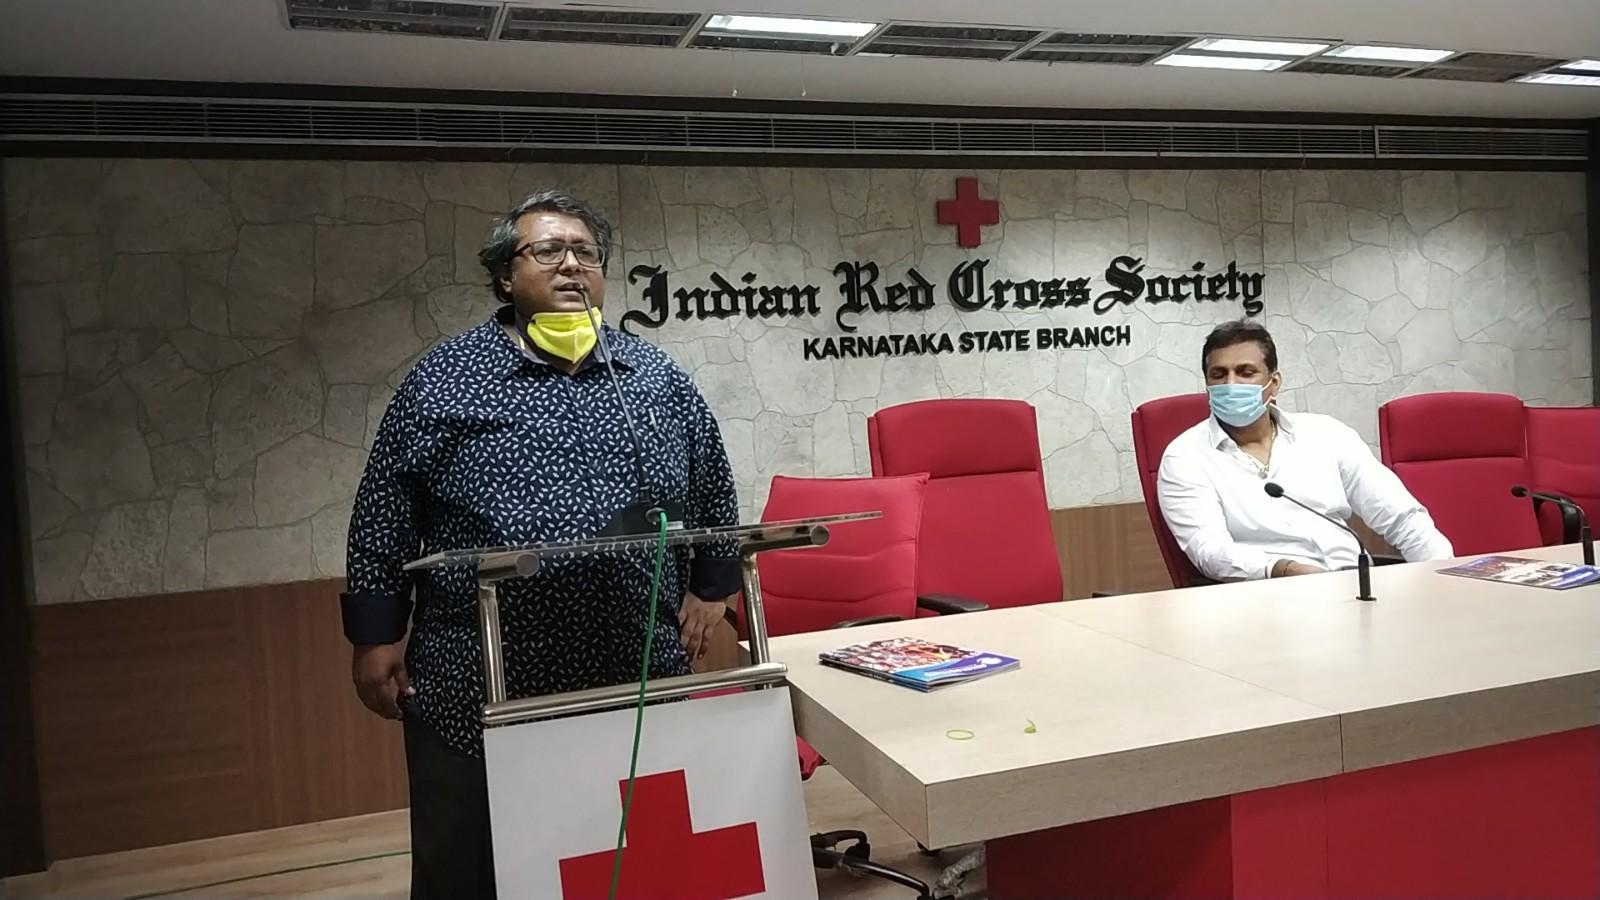 blood bank Indian Red Cross Society near Halasuru Karnataka